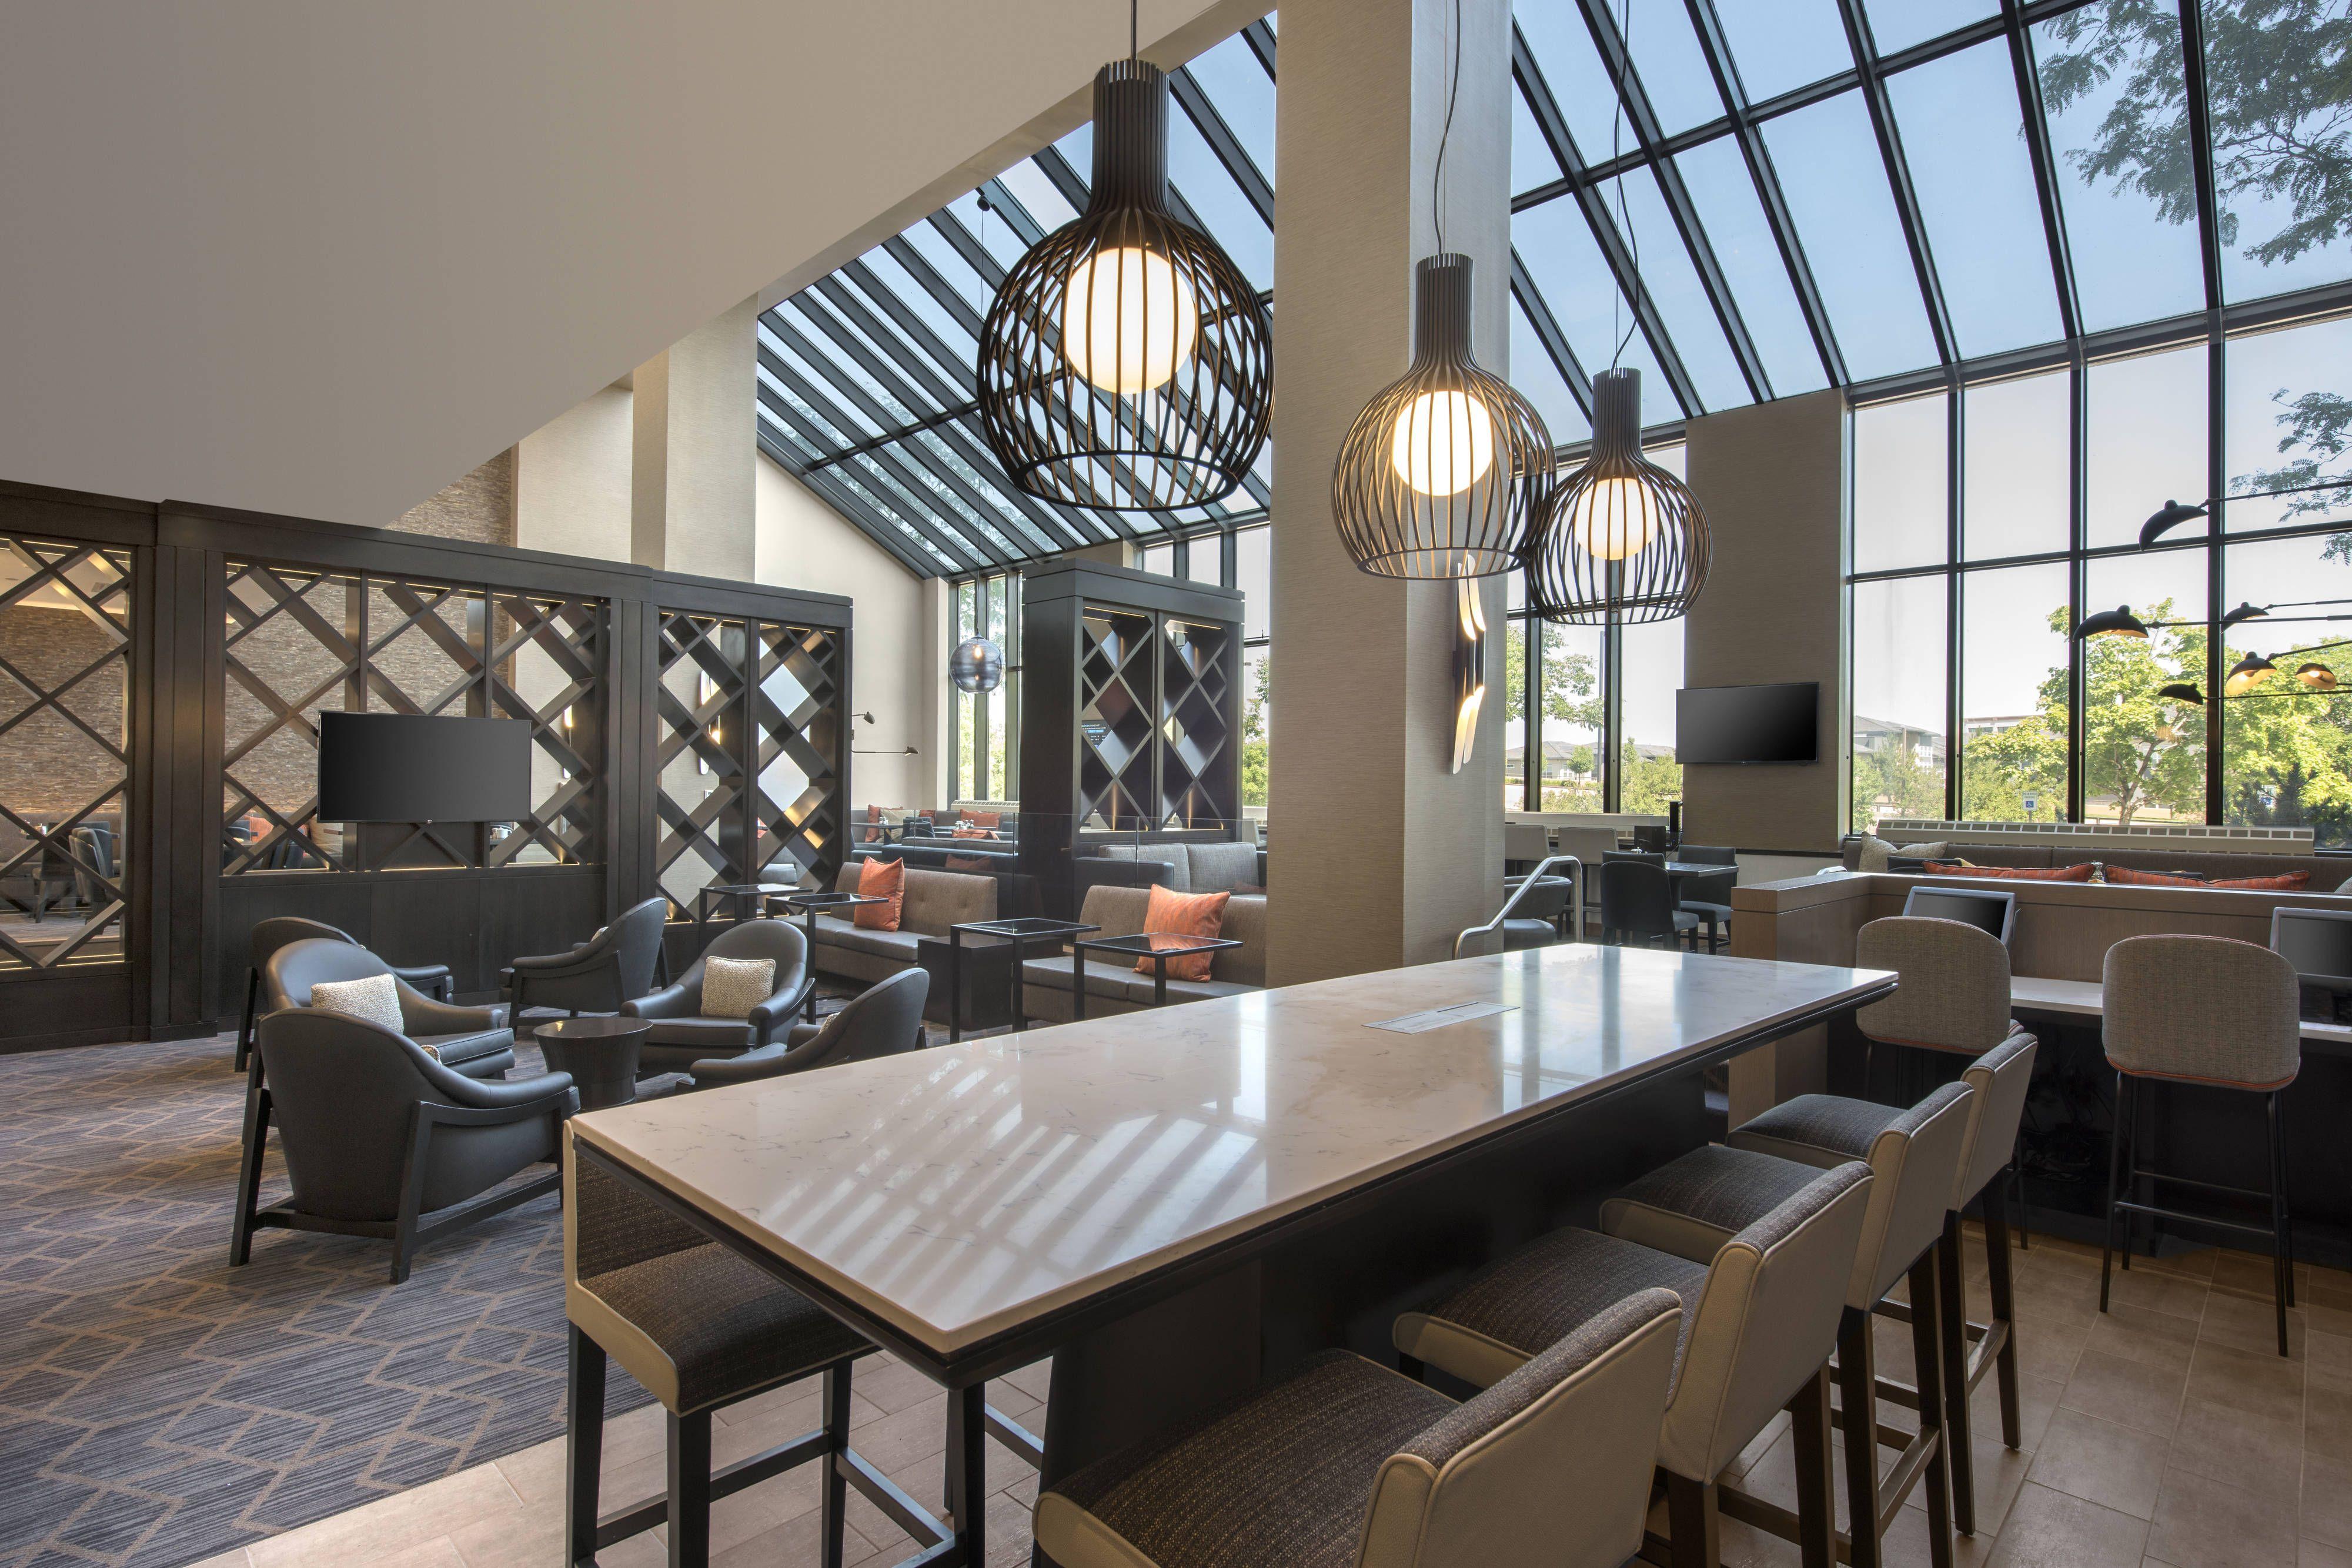 Denver Marriott Tech Center M Club Lounge Hotel Guestbathroom